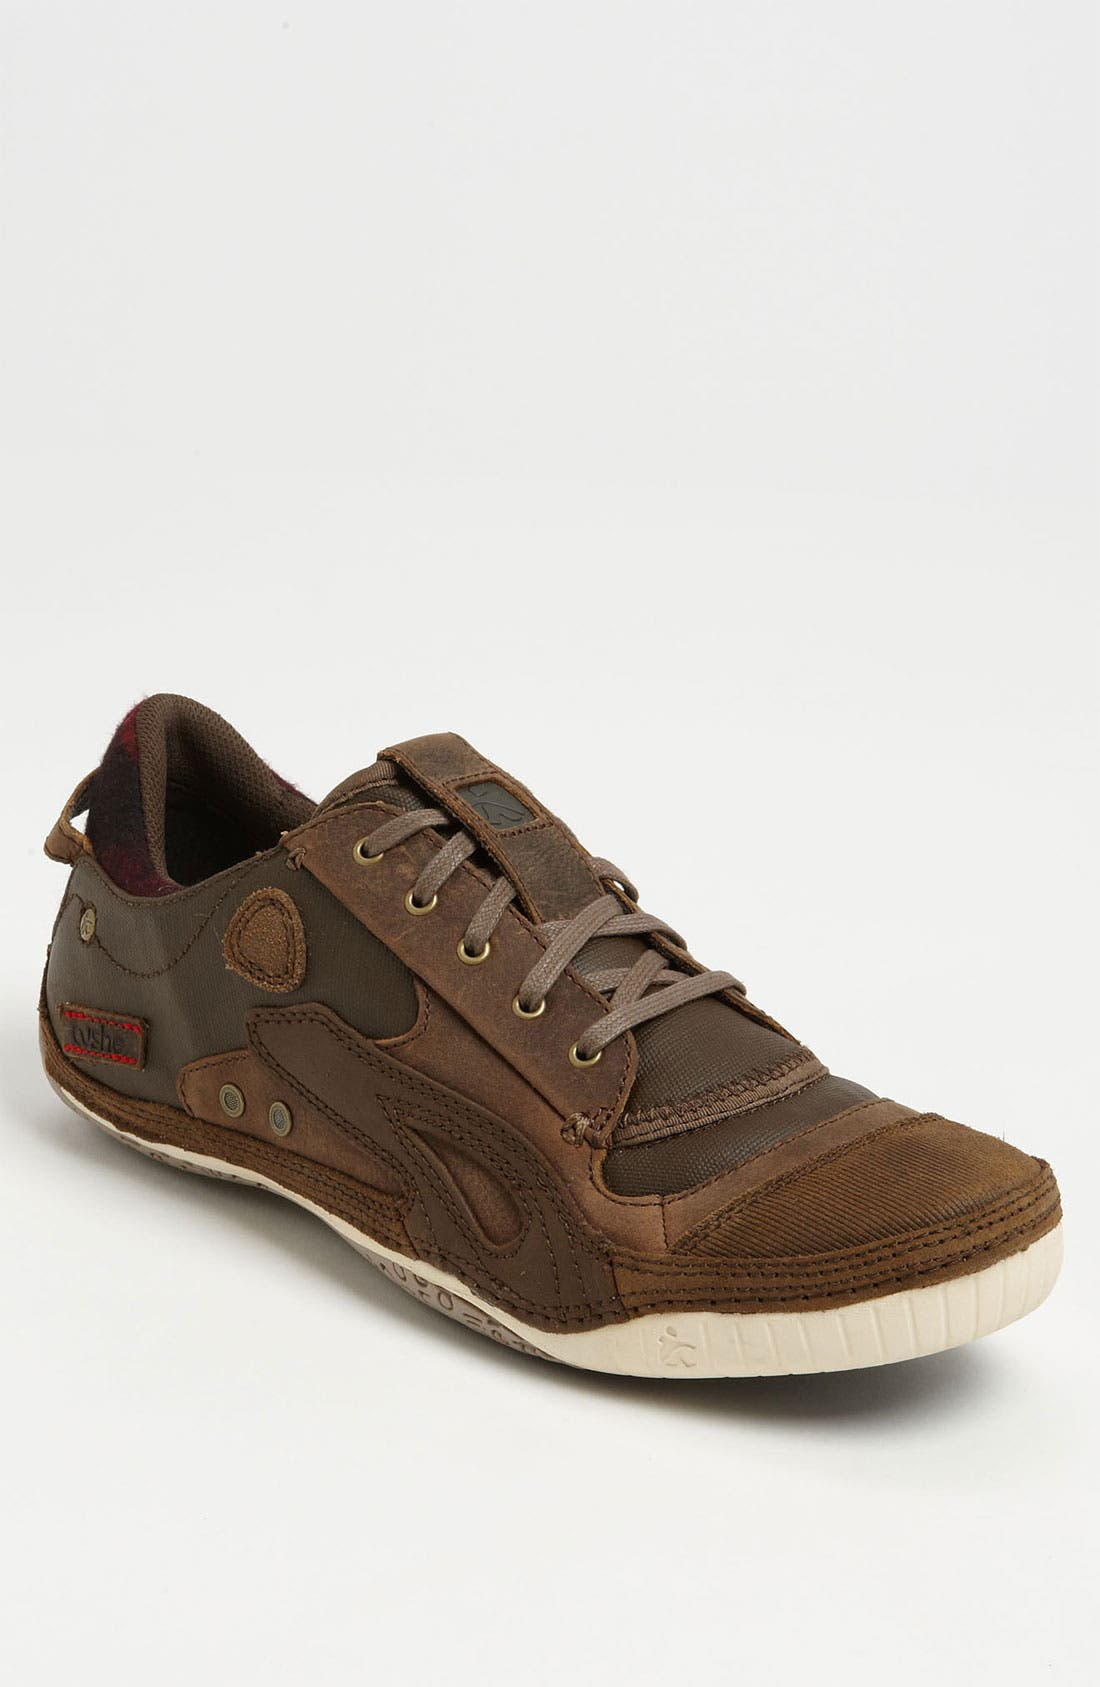 Alternate Image 1 Selected - Cushe 'Boutique Sneak' Sneaker (Men)